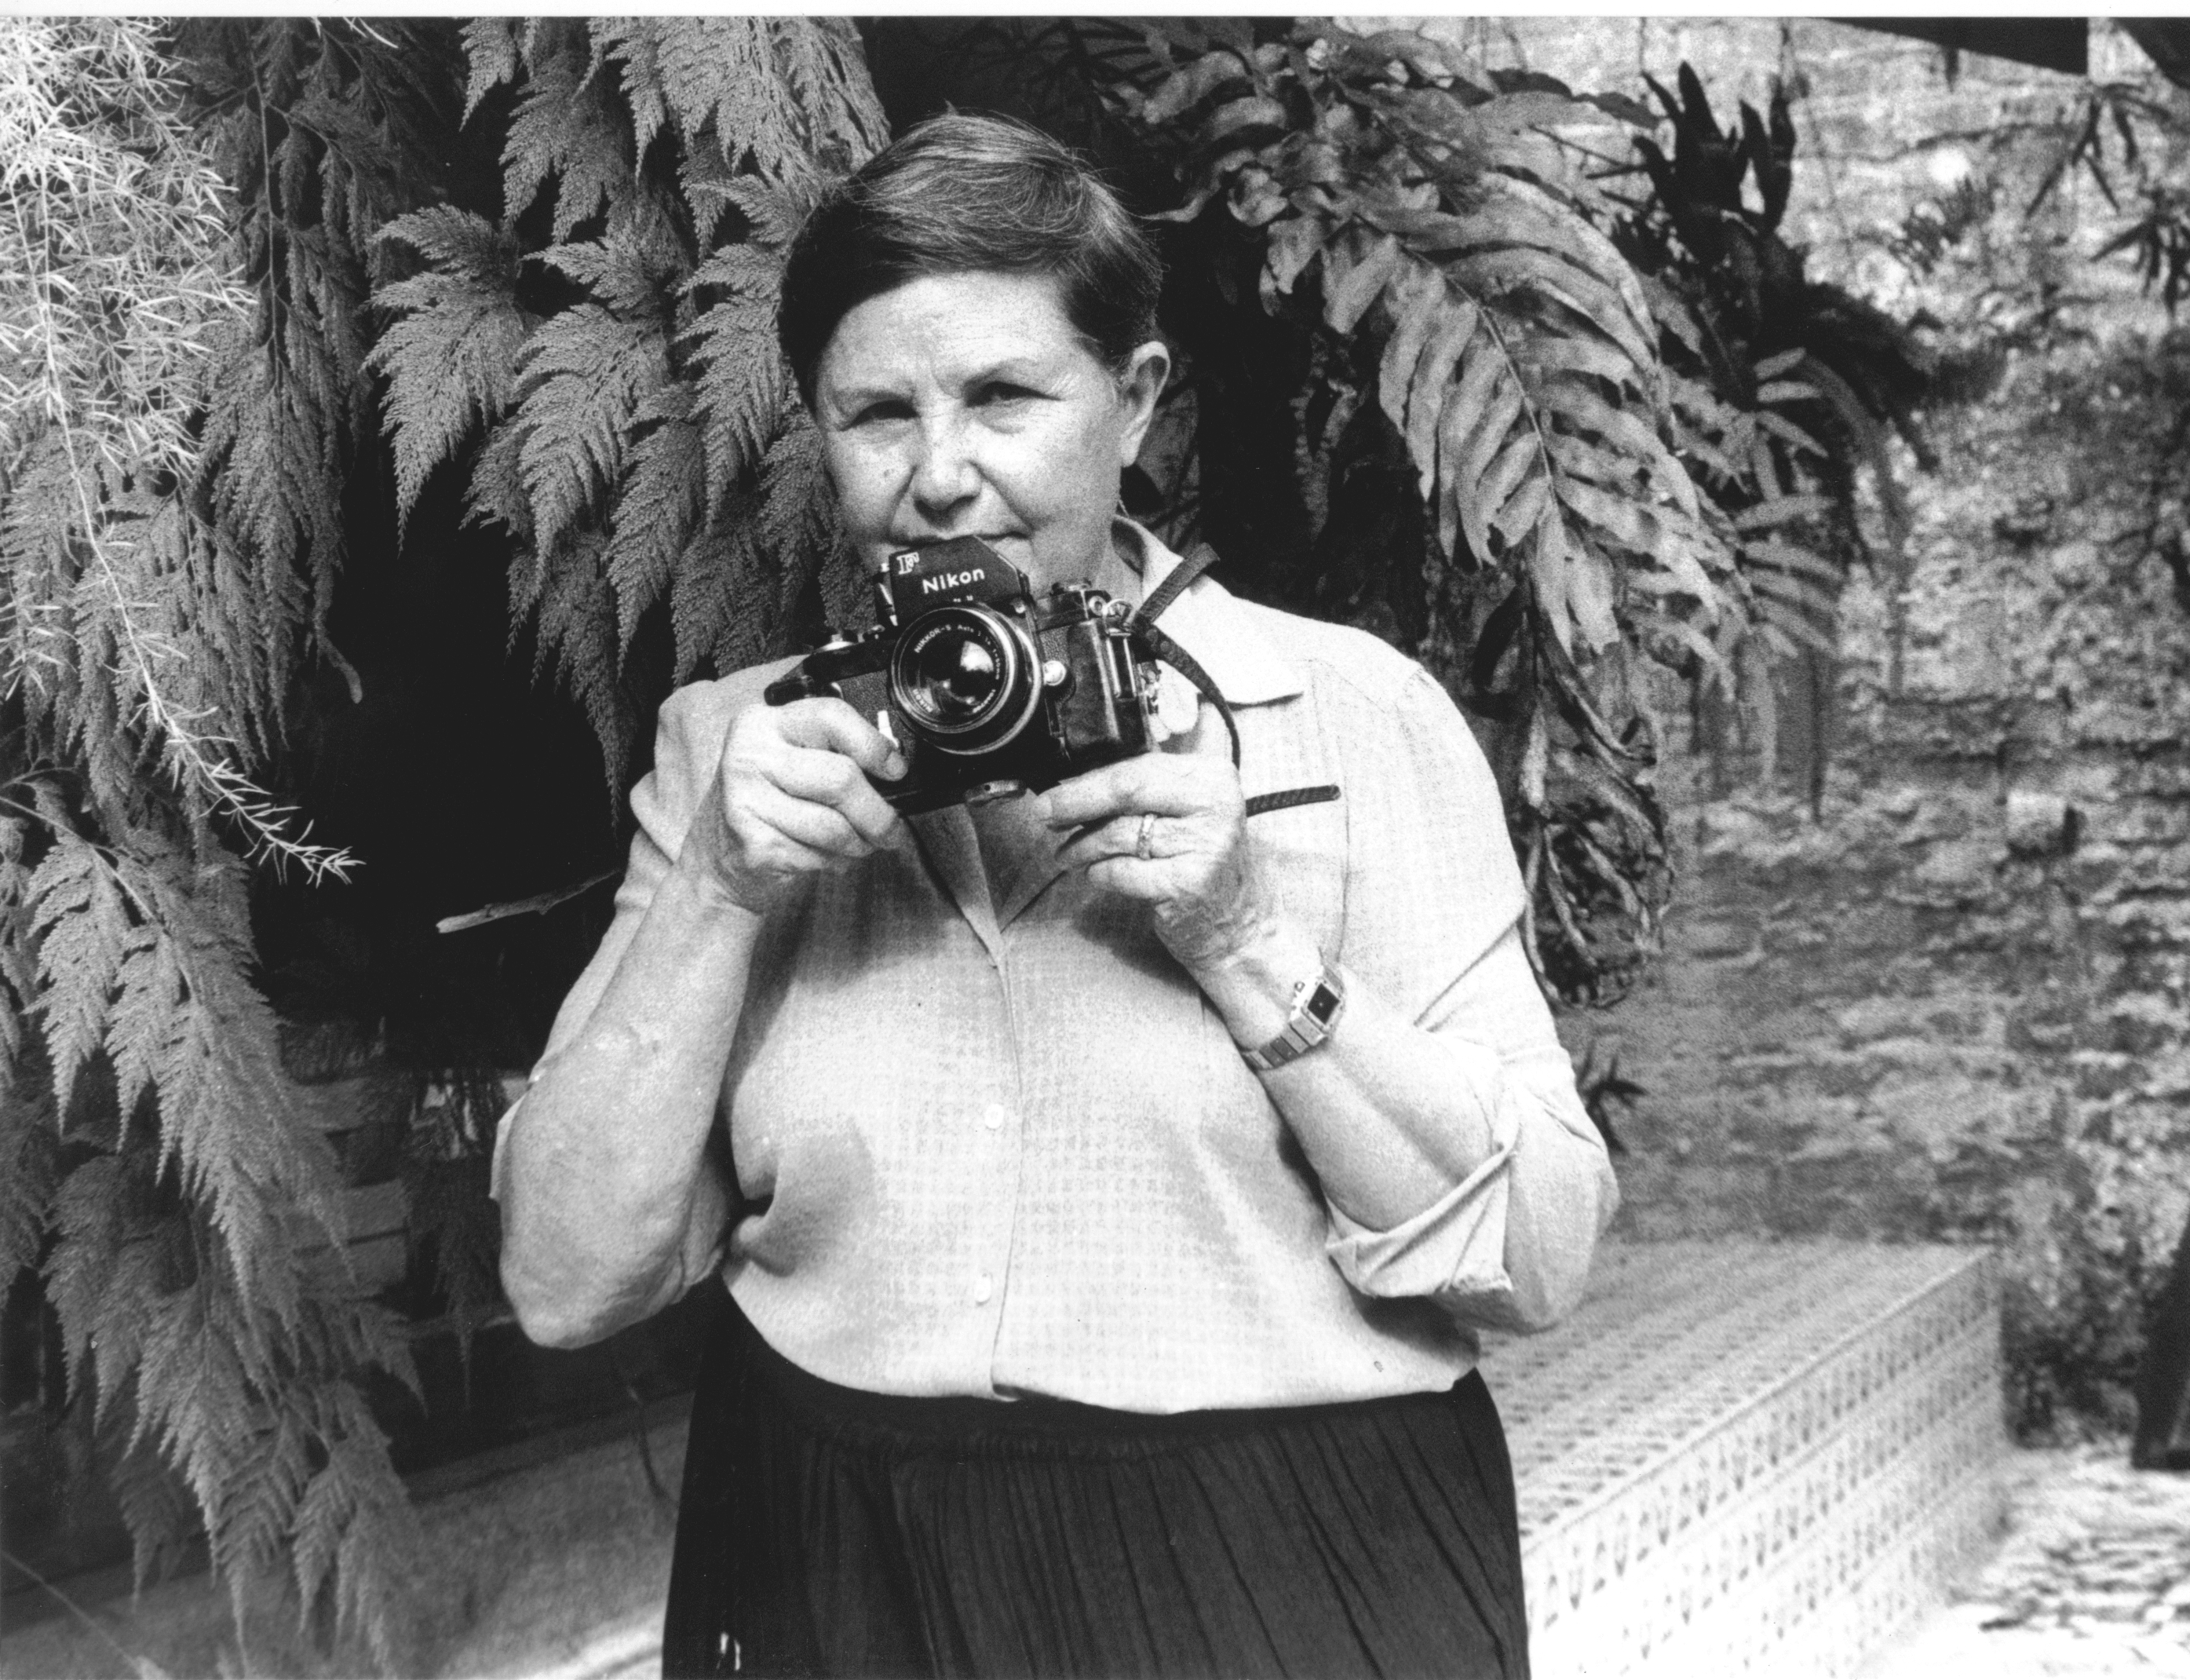 Zélia Gattai na Casa do Rio Vermelho, 1992. (4)